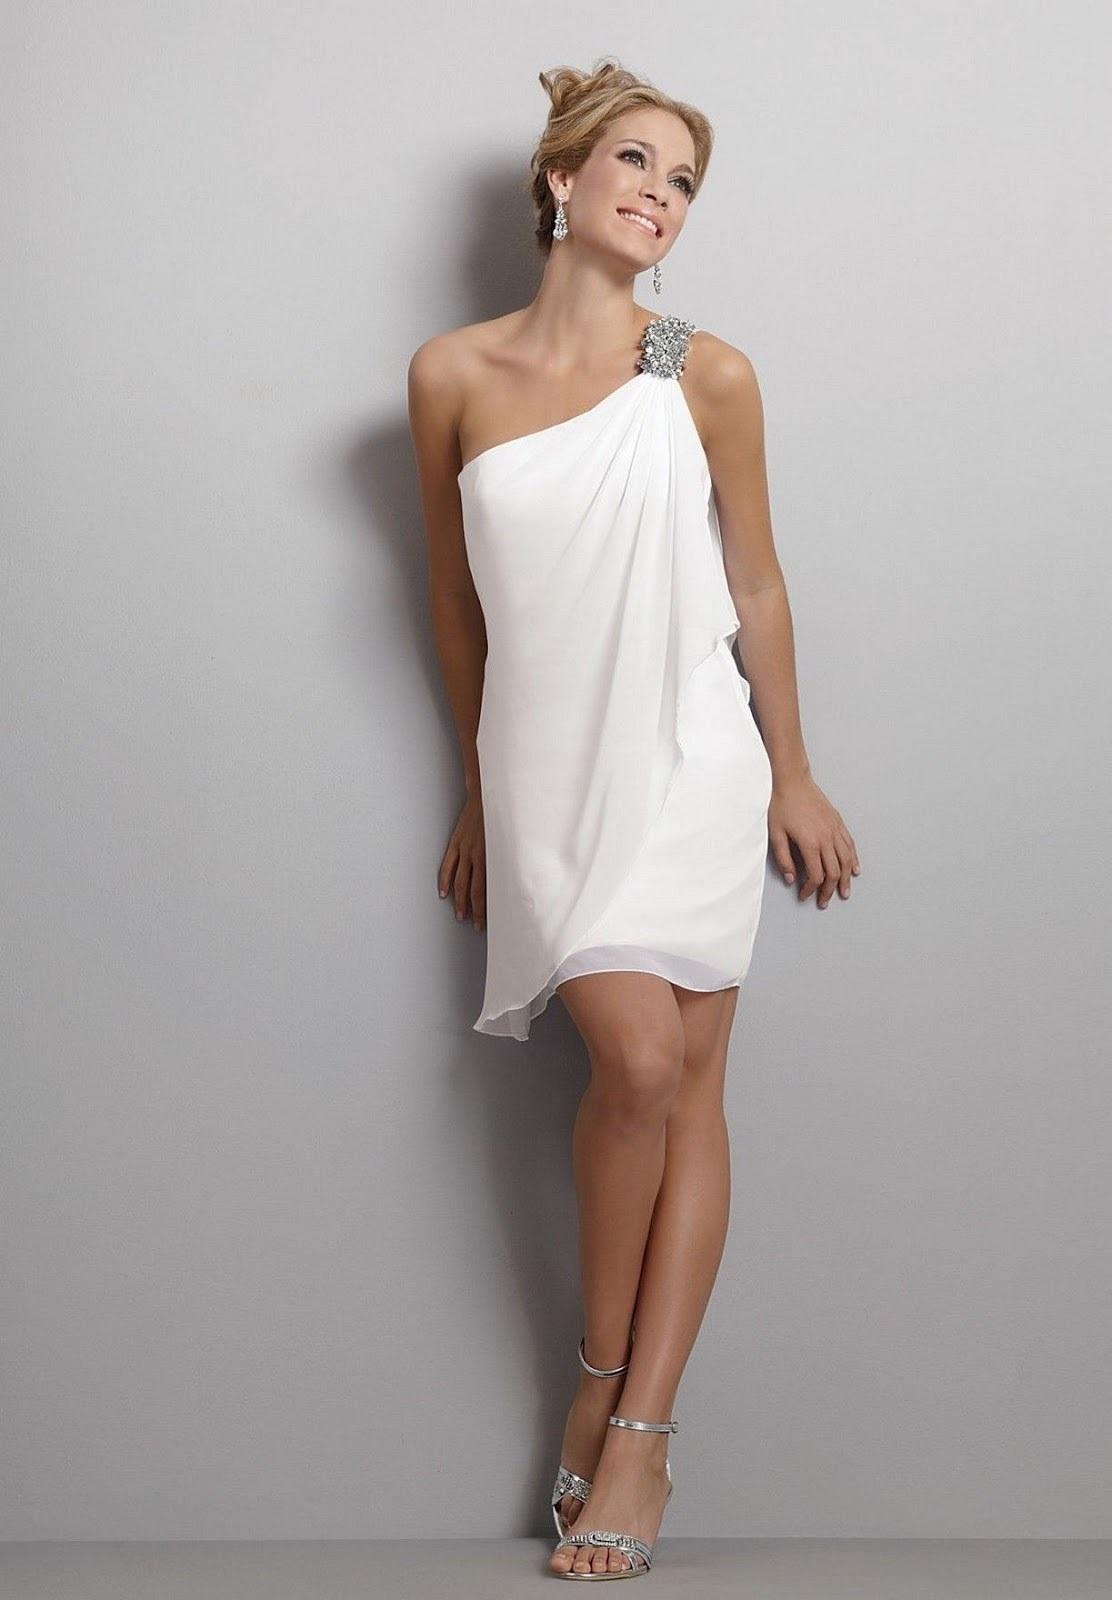 17 coolest variants of short wedding dresses the best for Simple wedding dresses short